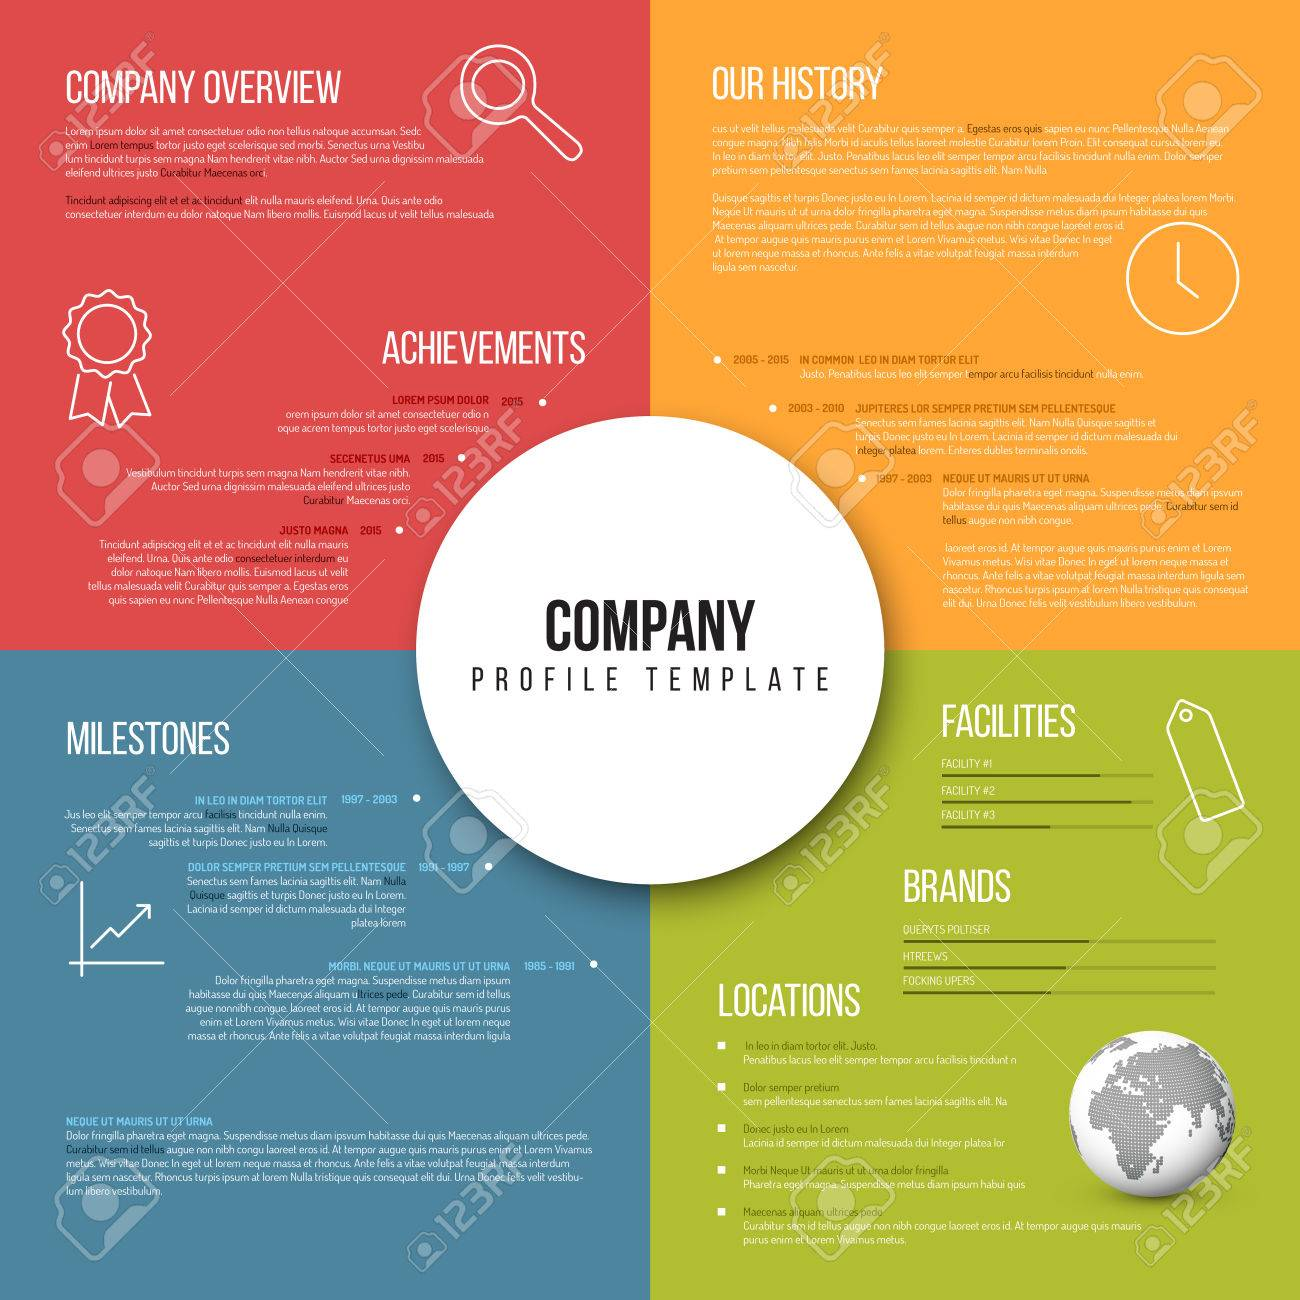 company overview templates akba katadhin co